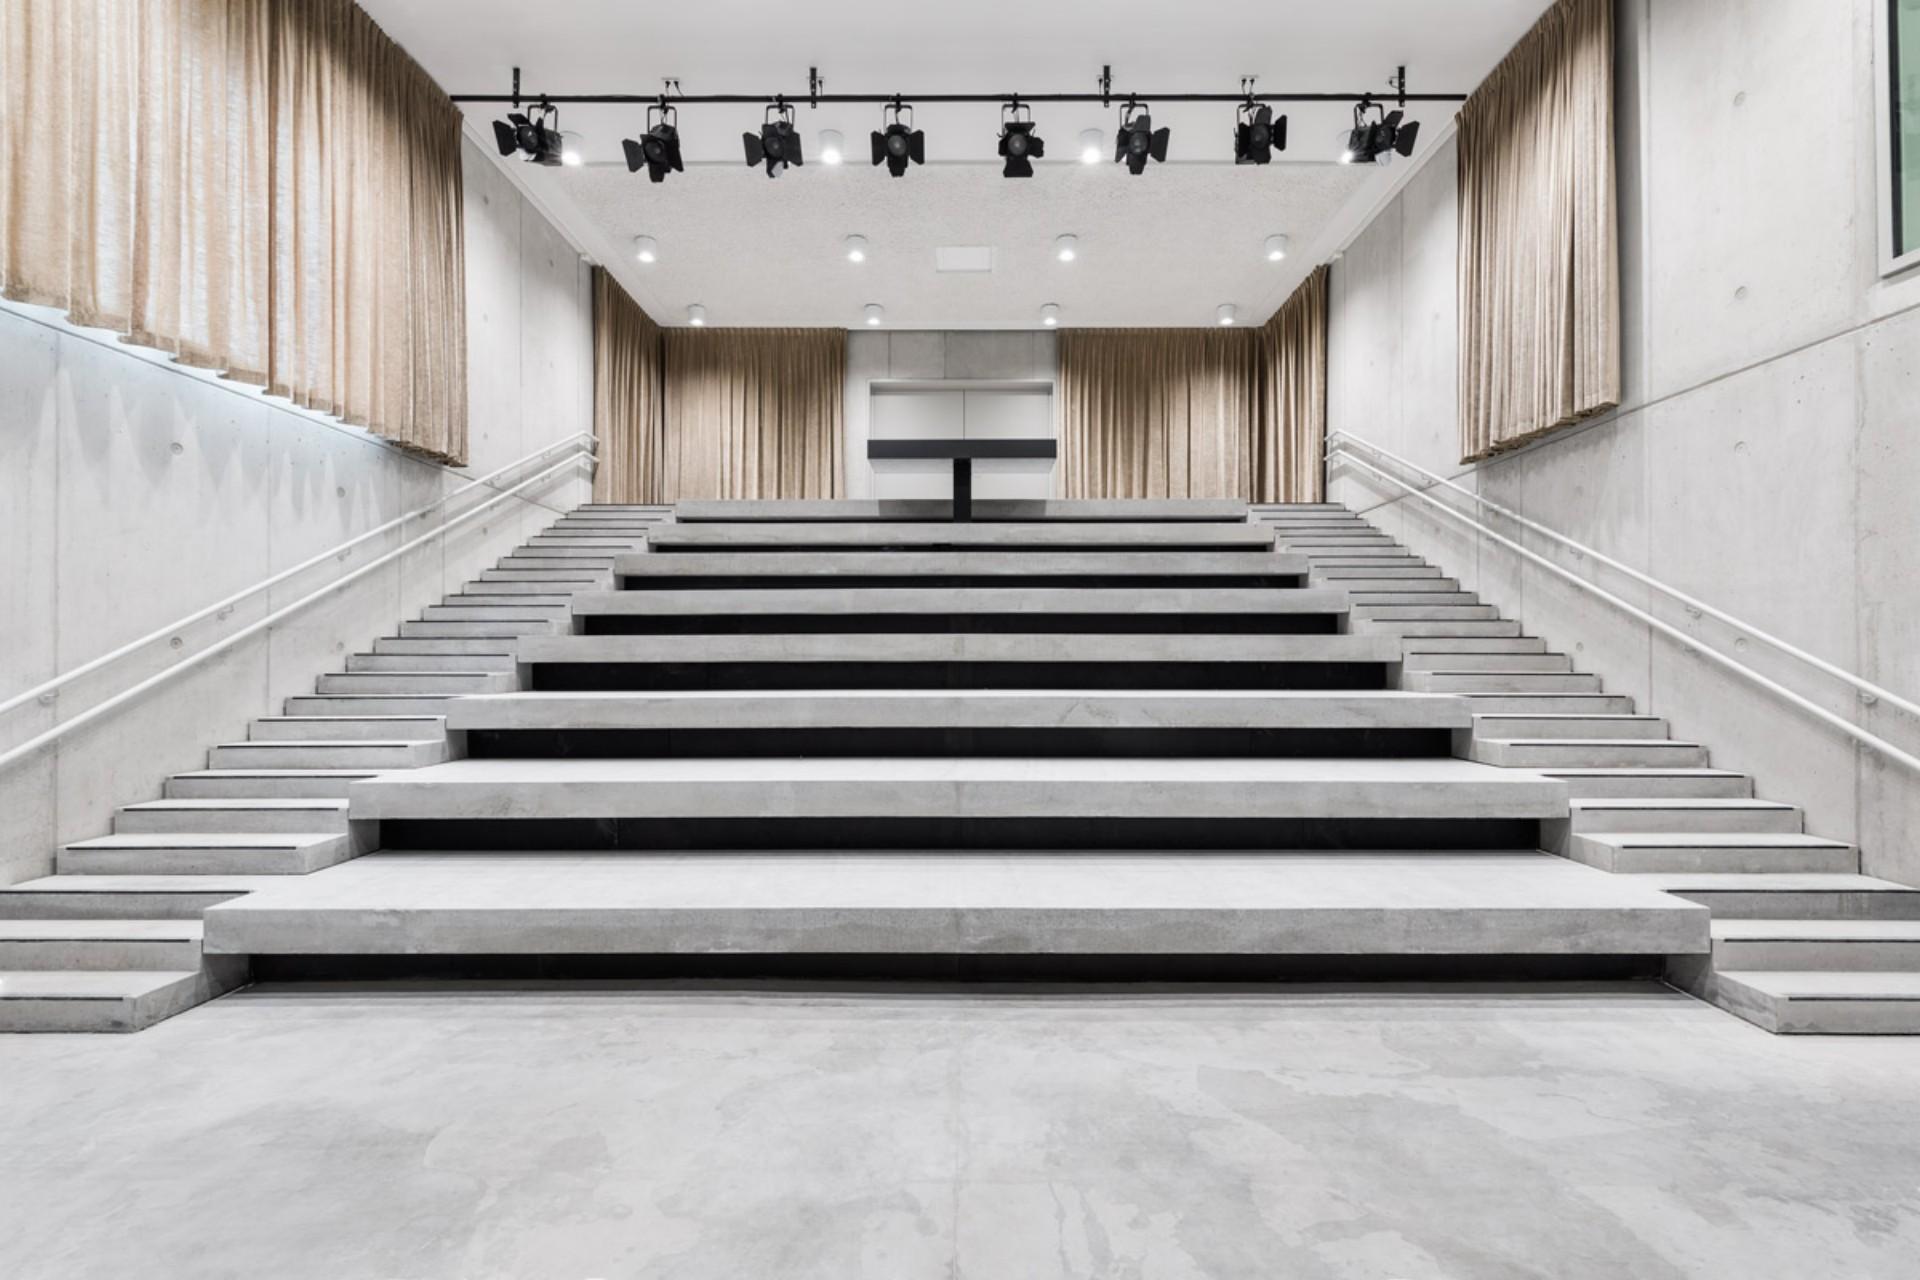 Le KAAN Architecten Utopia Library and Academy of Performing Arts in Aalst, Belgium